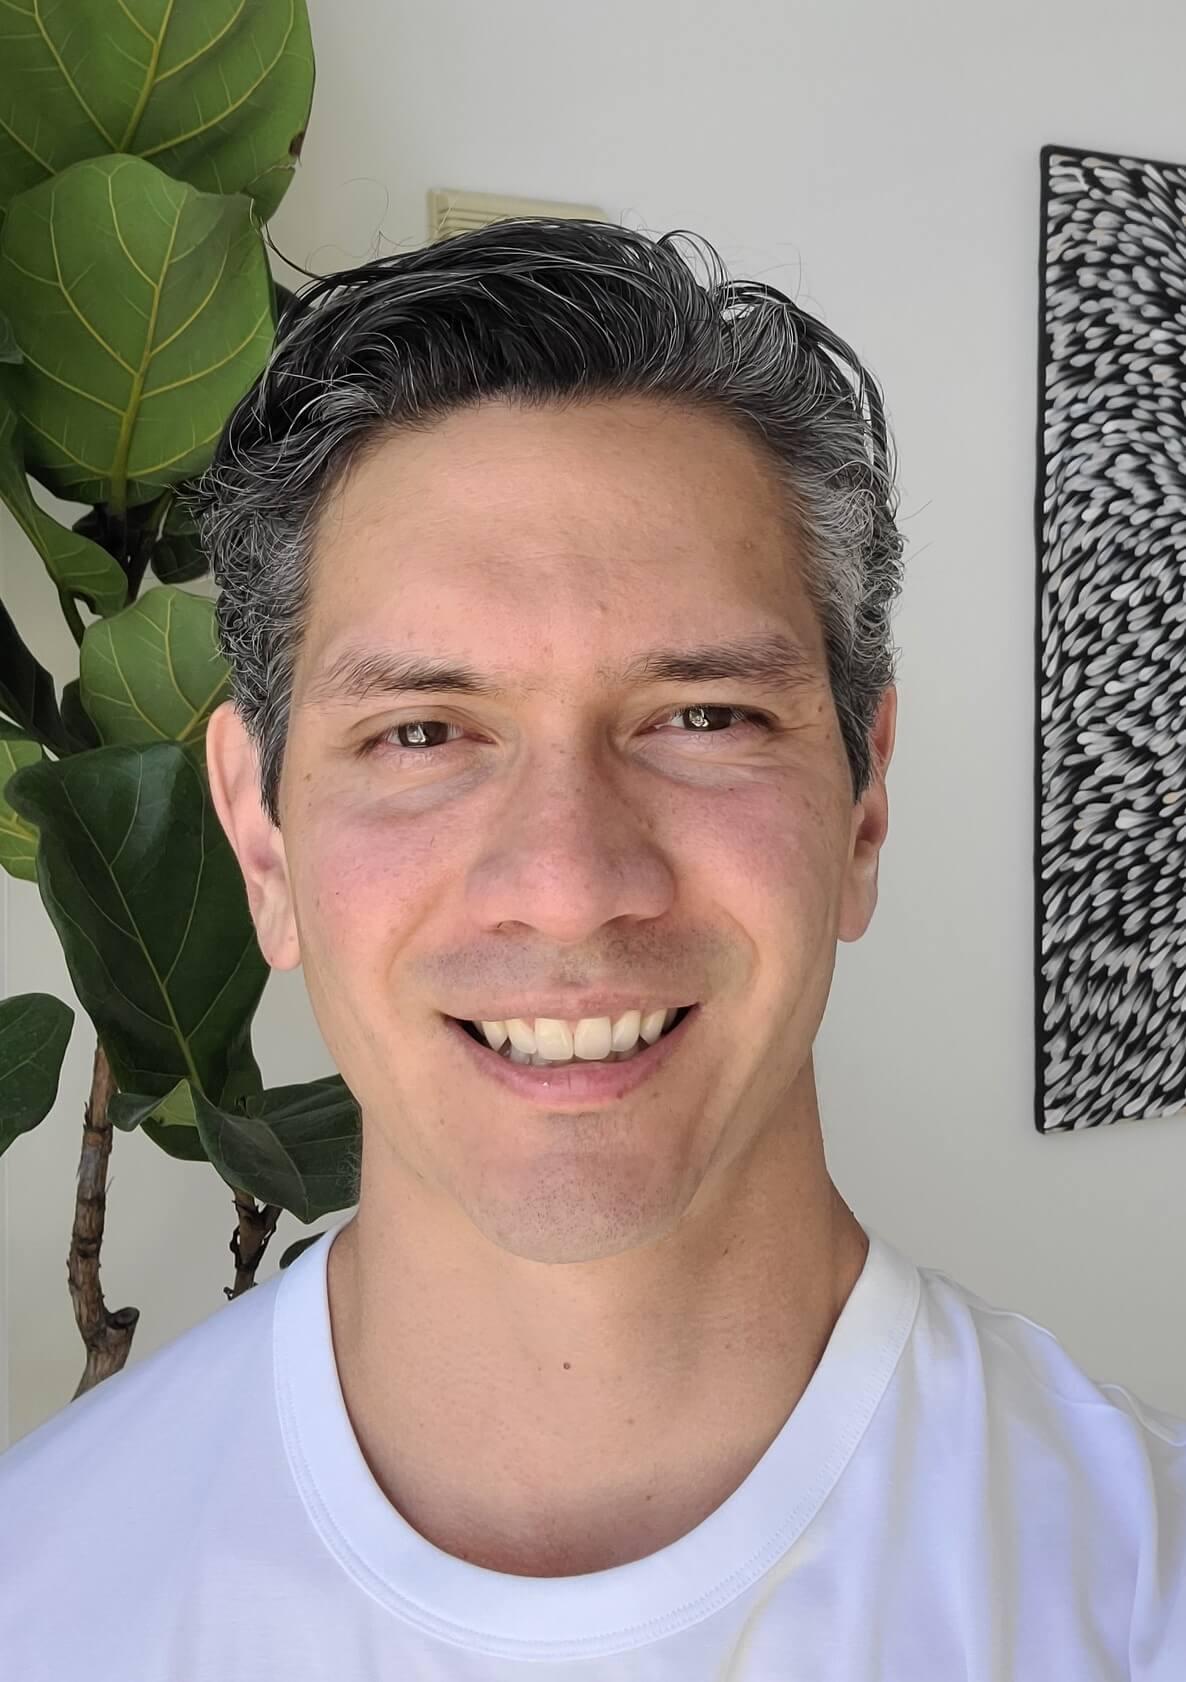 Headshot of Remadely's Founder Josh Spry